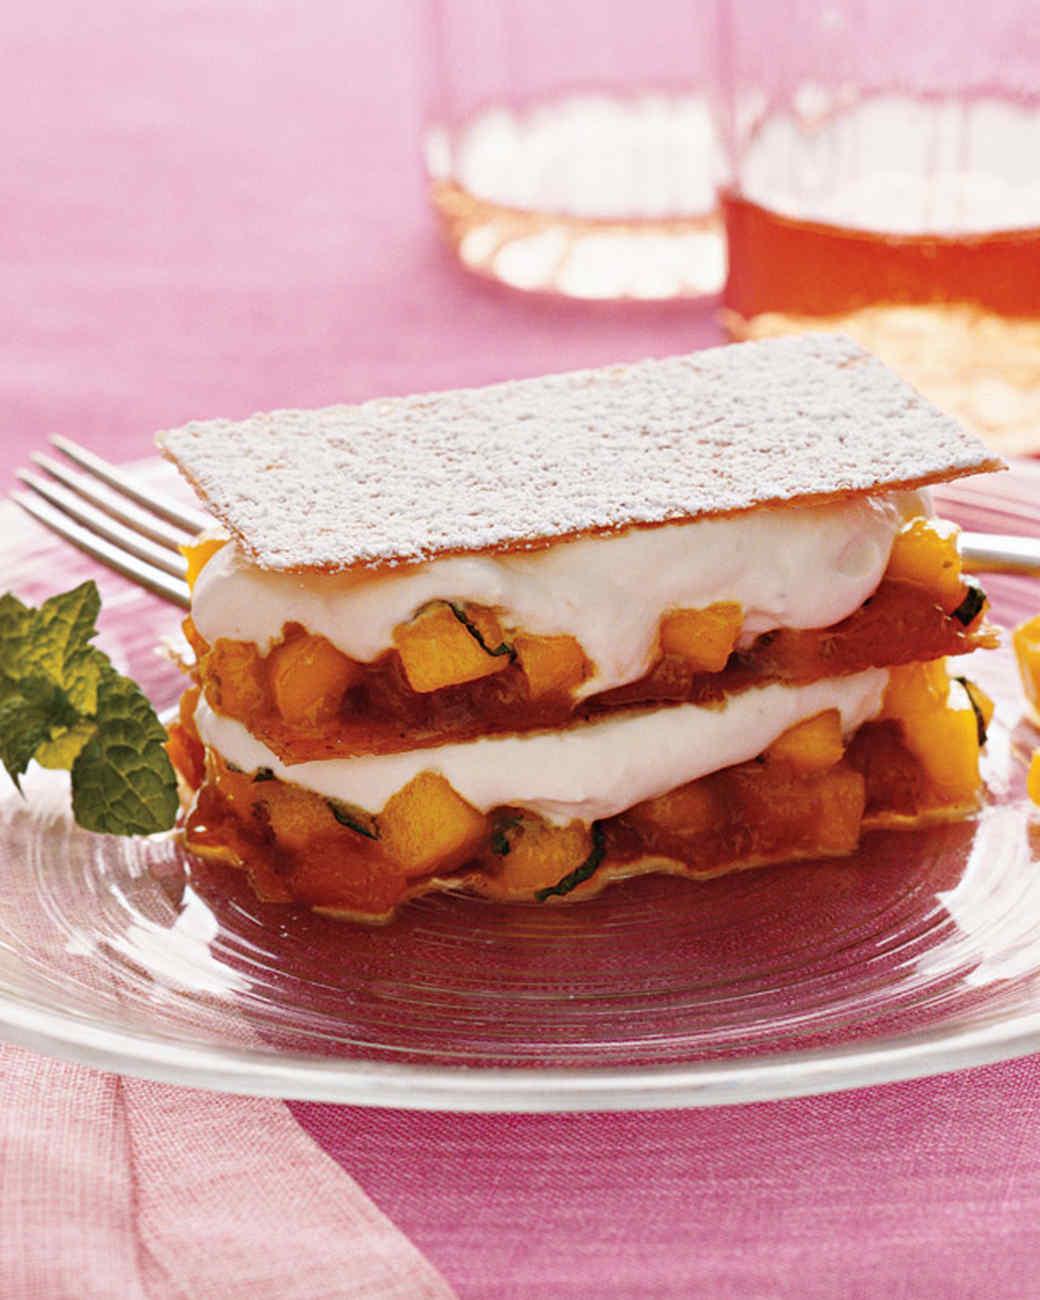 Mango Napoleons with Caramel and Cream